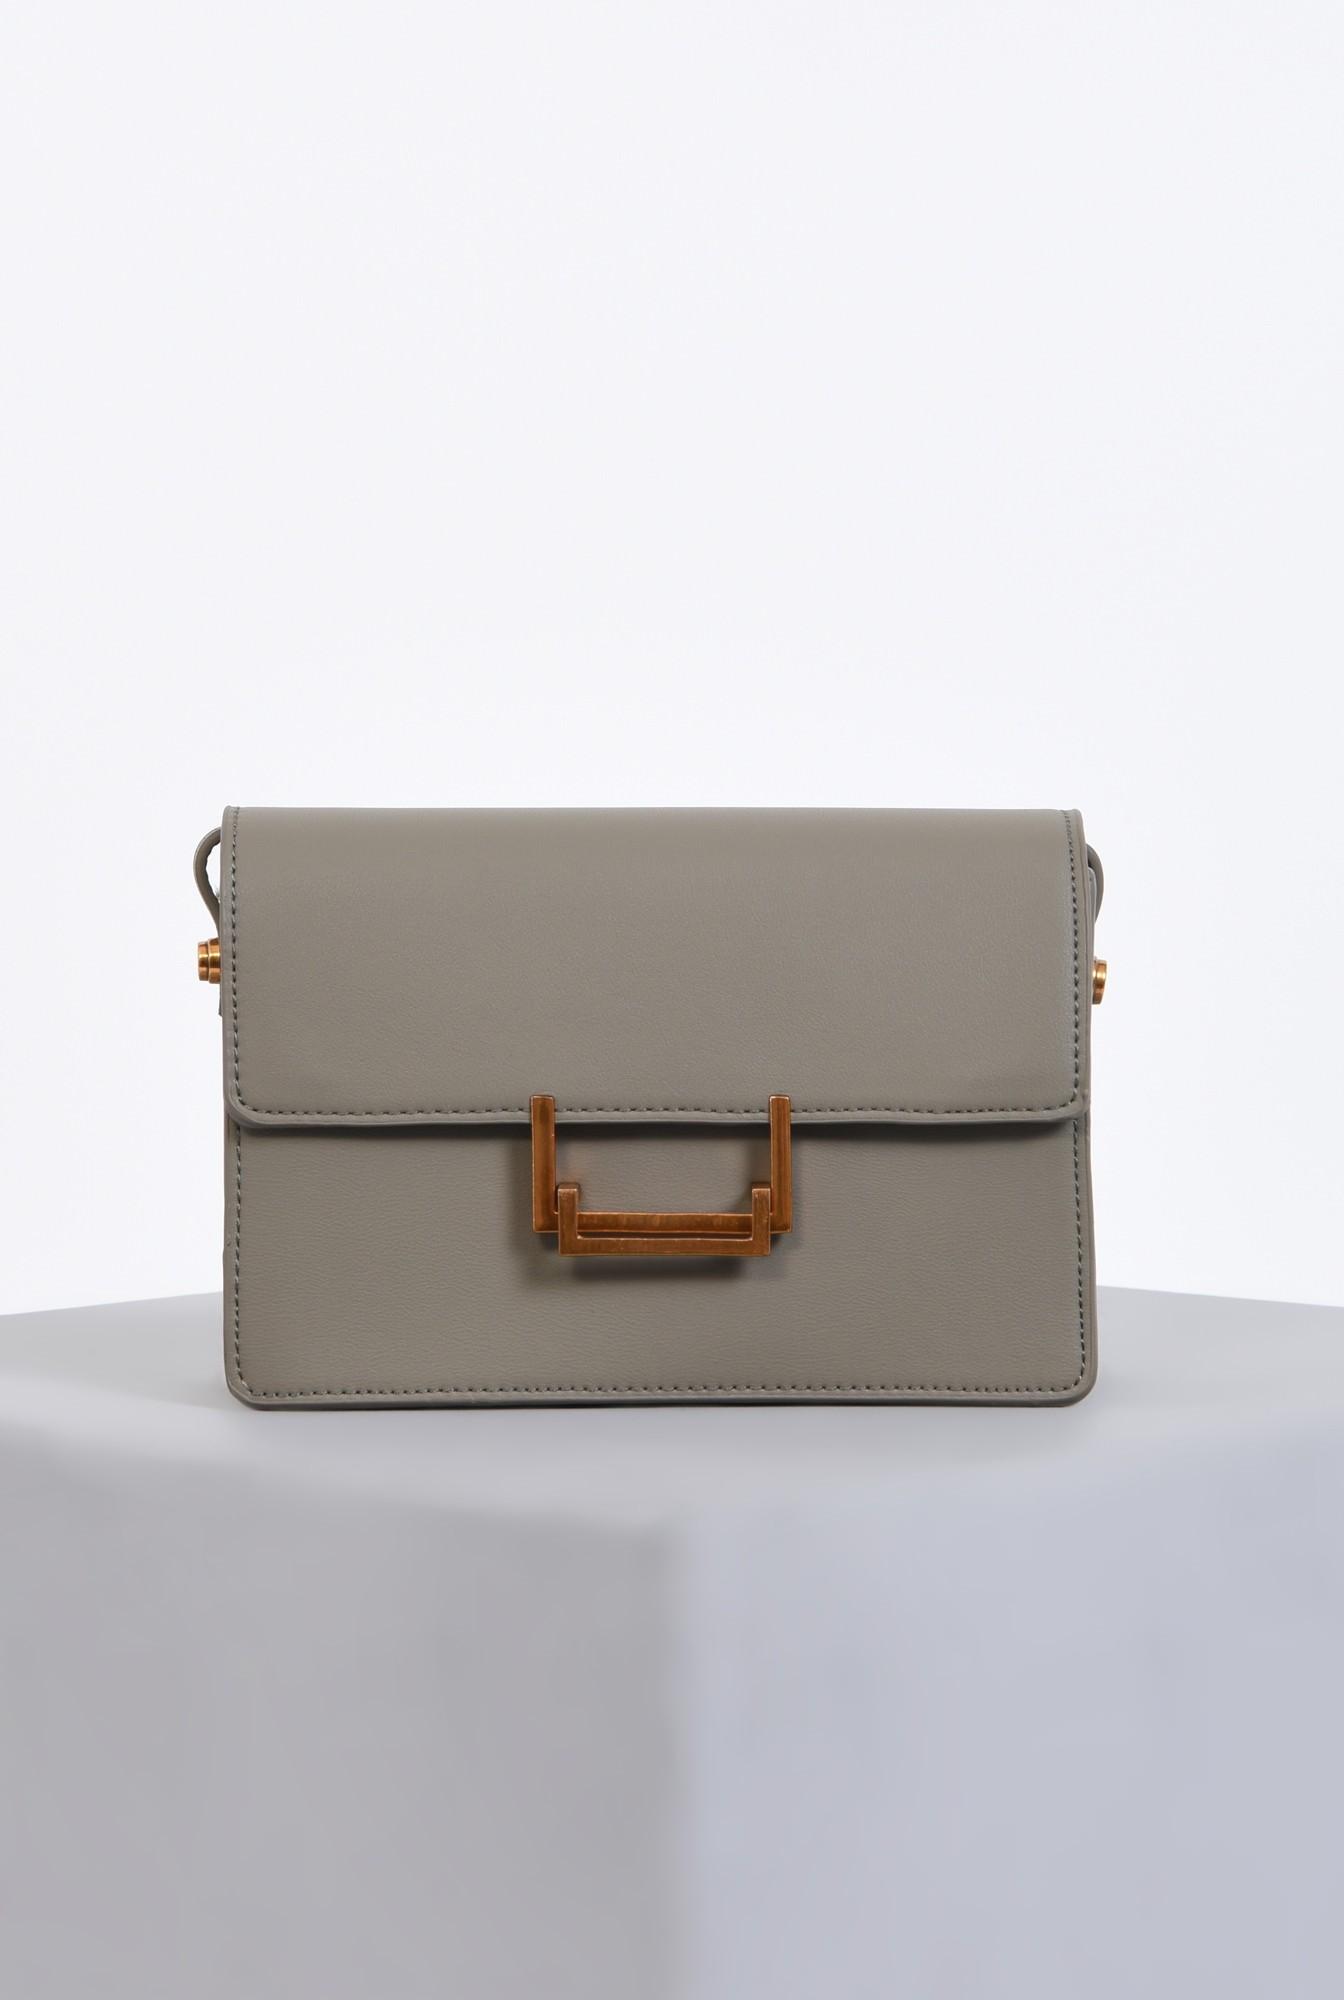 0 - geanta medie, accesorii, gri, poseta casual